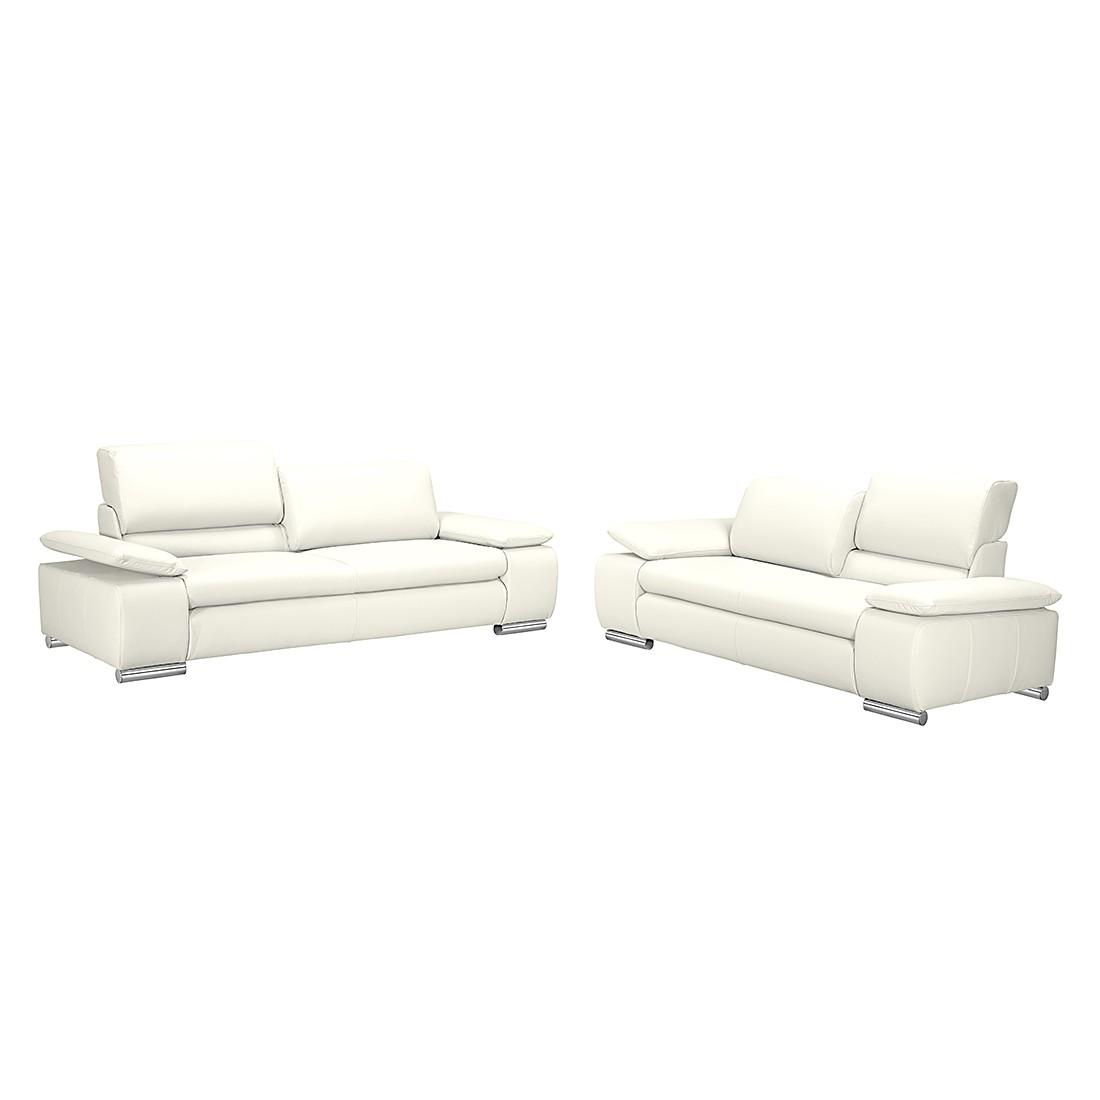 Canapé panoramique Masca (3 - 2) - Imitation cuir blanc, Fredriks